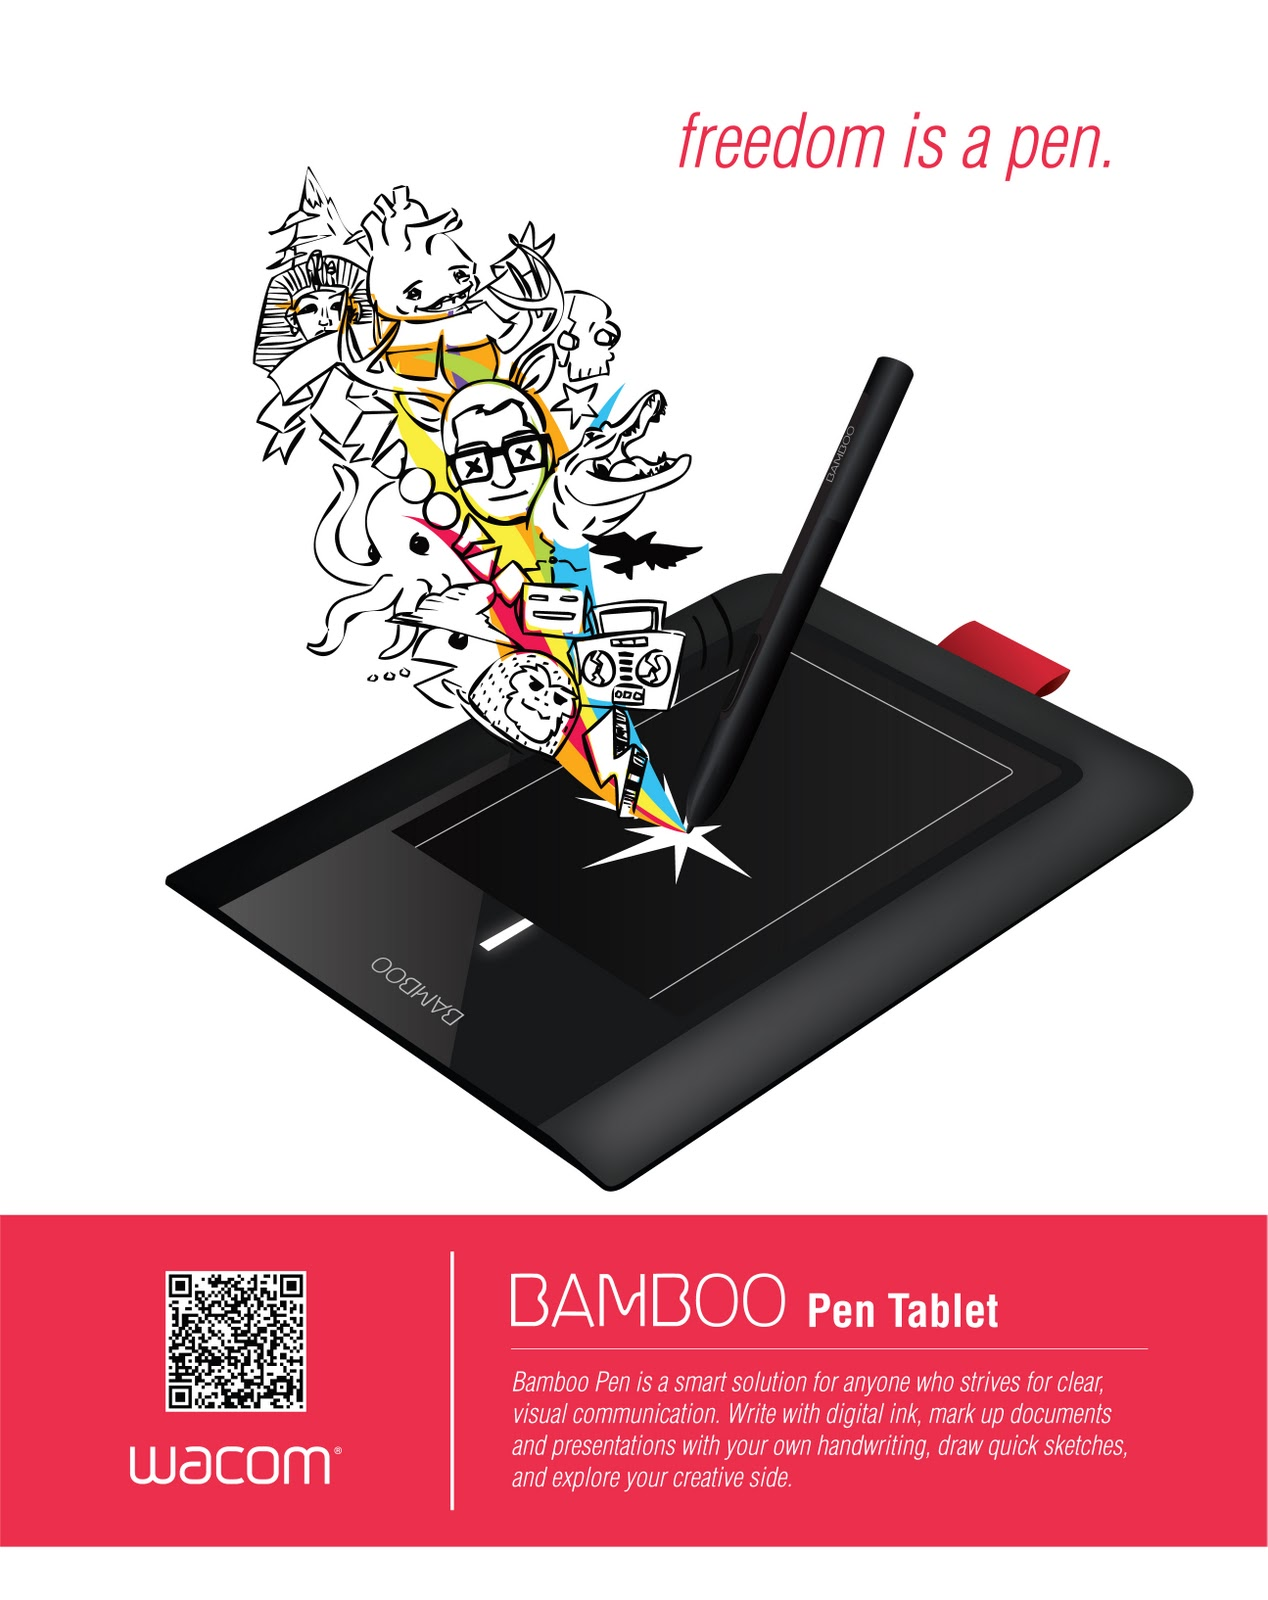 B9 Design WACOM Tablet Magazine Ad